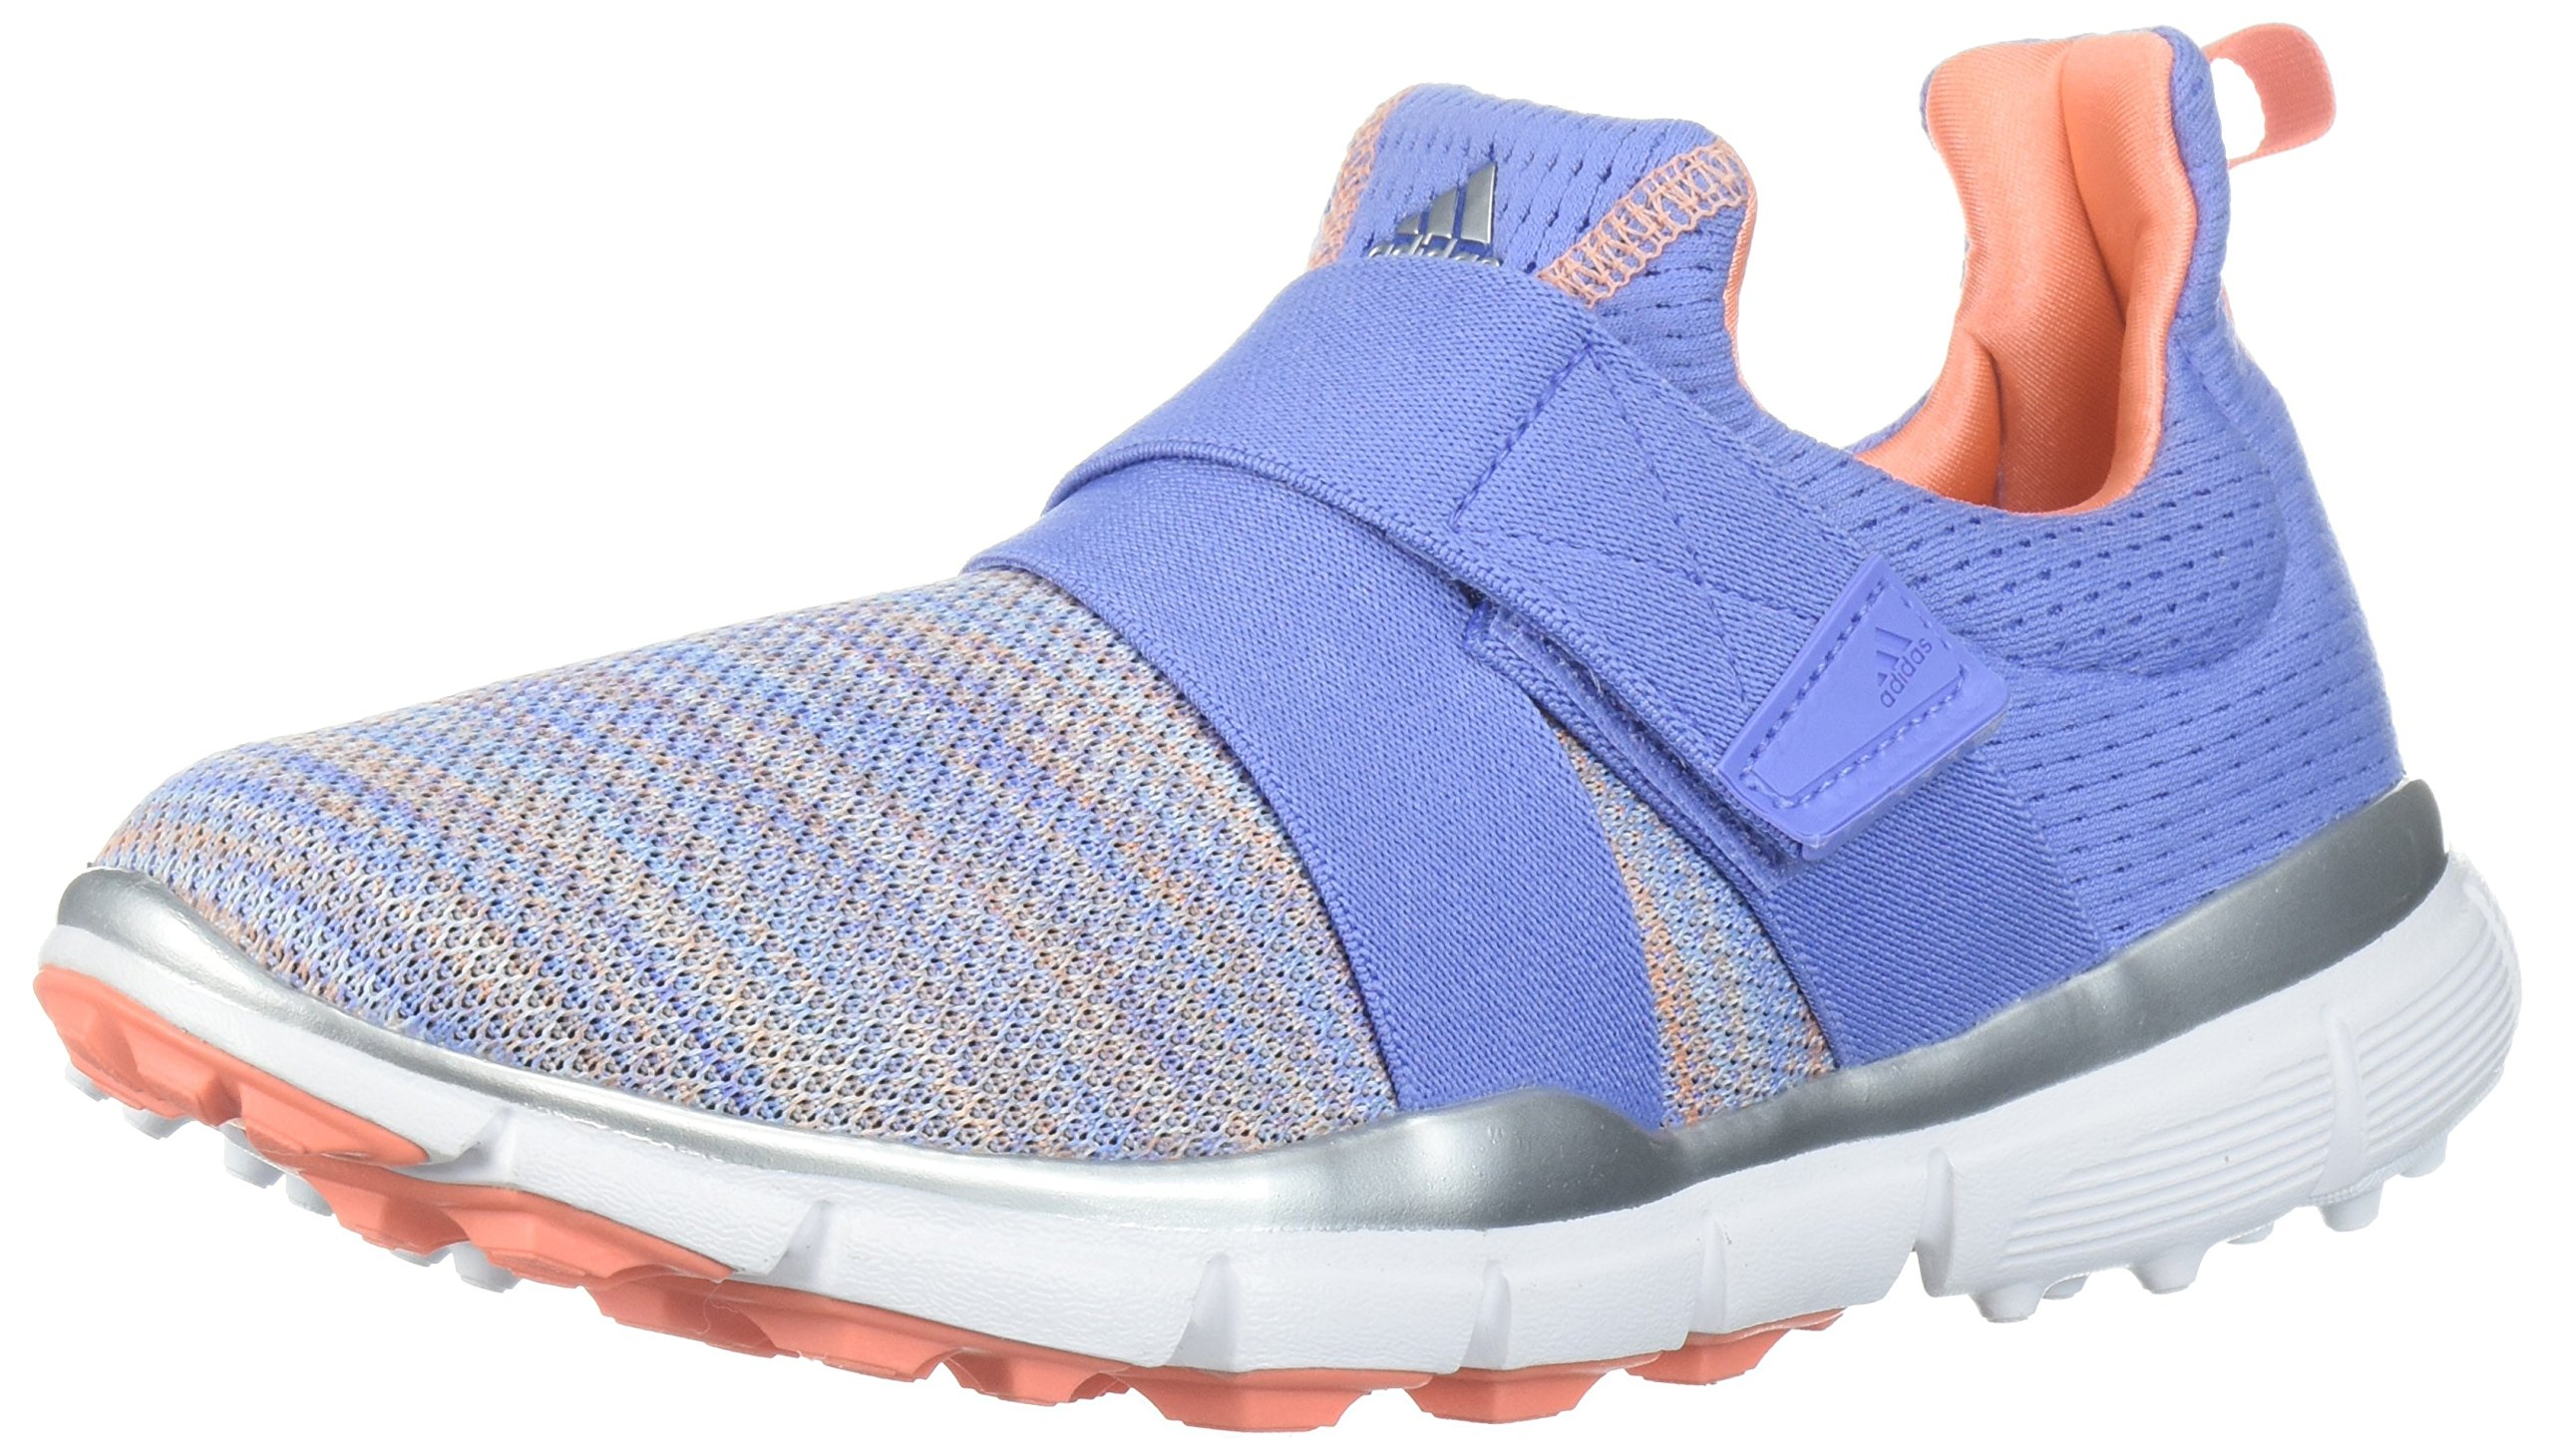 adidas Women's Climacool Knit Golf Shoe, Chalk Purple/Blue/Coral s, 5 M US